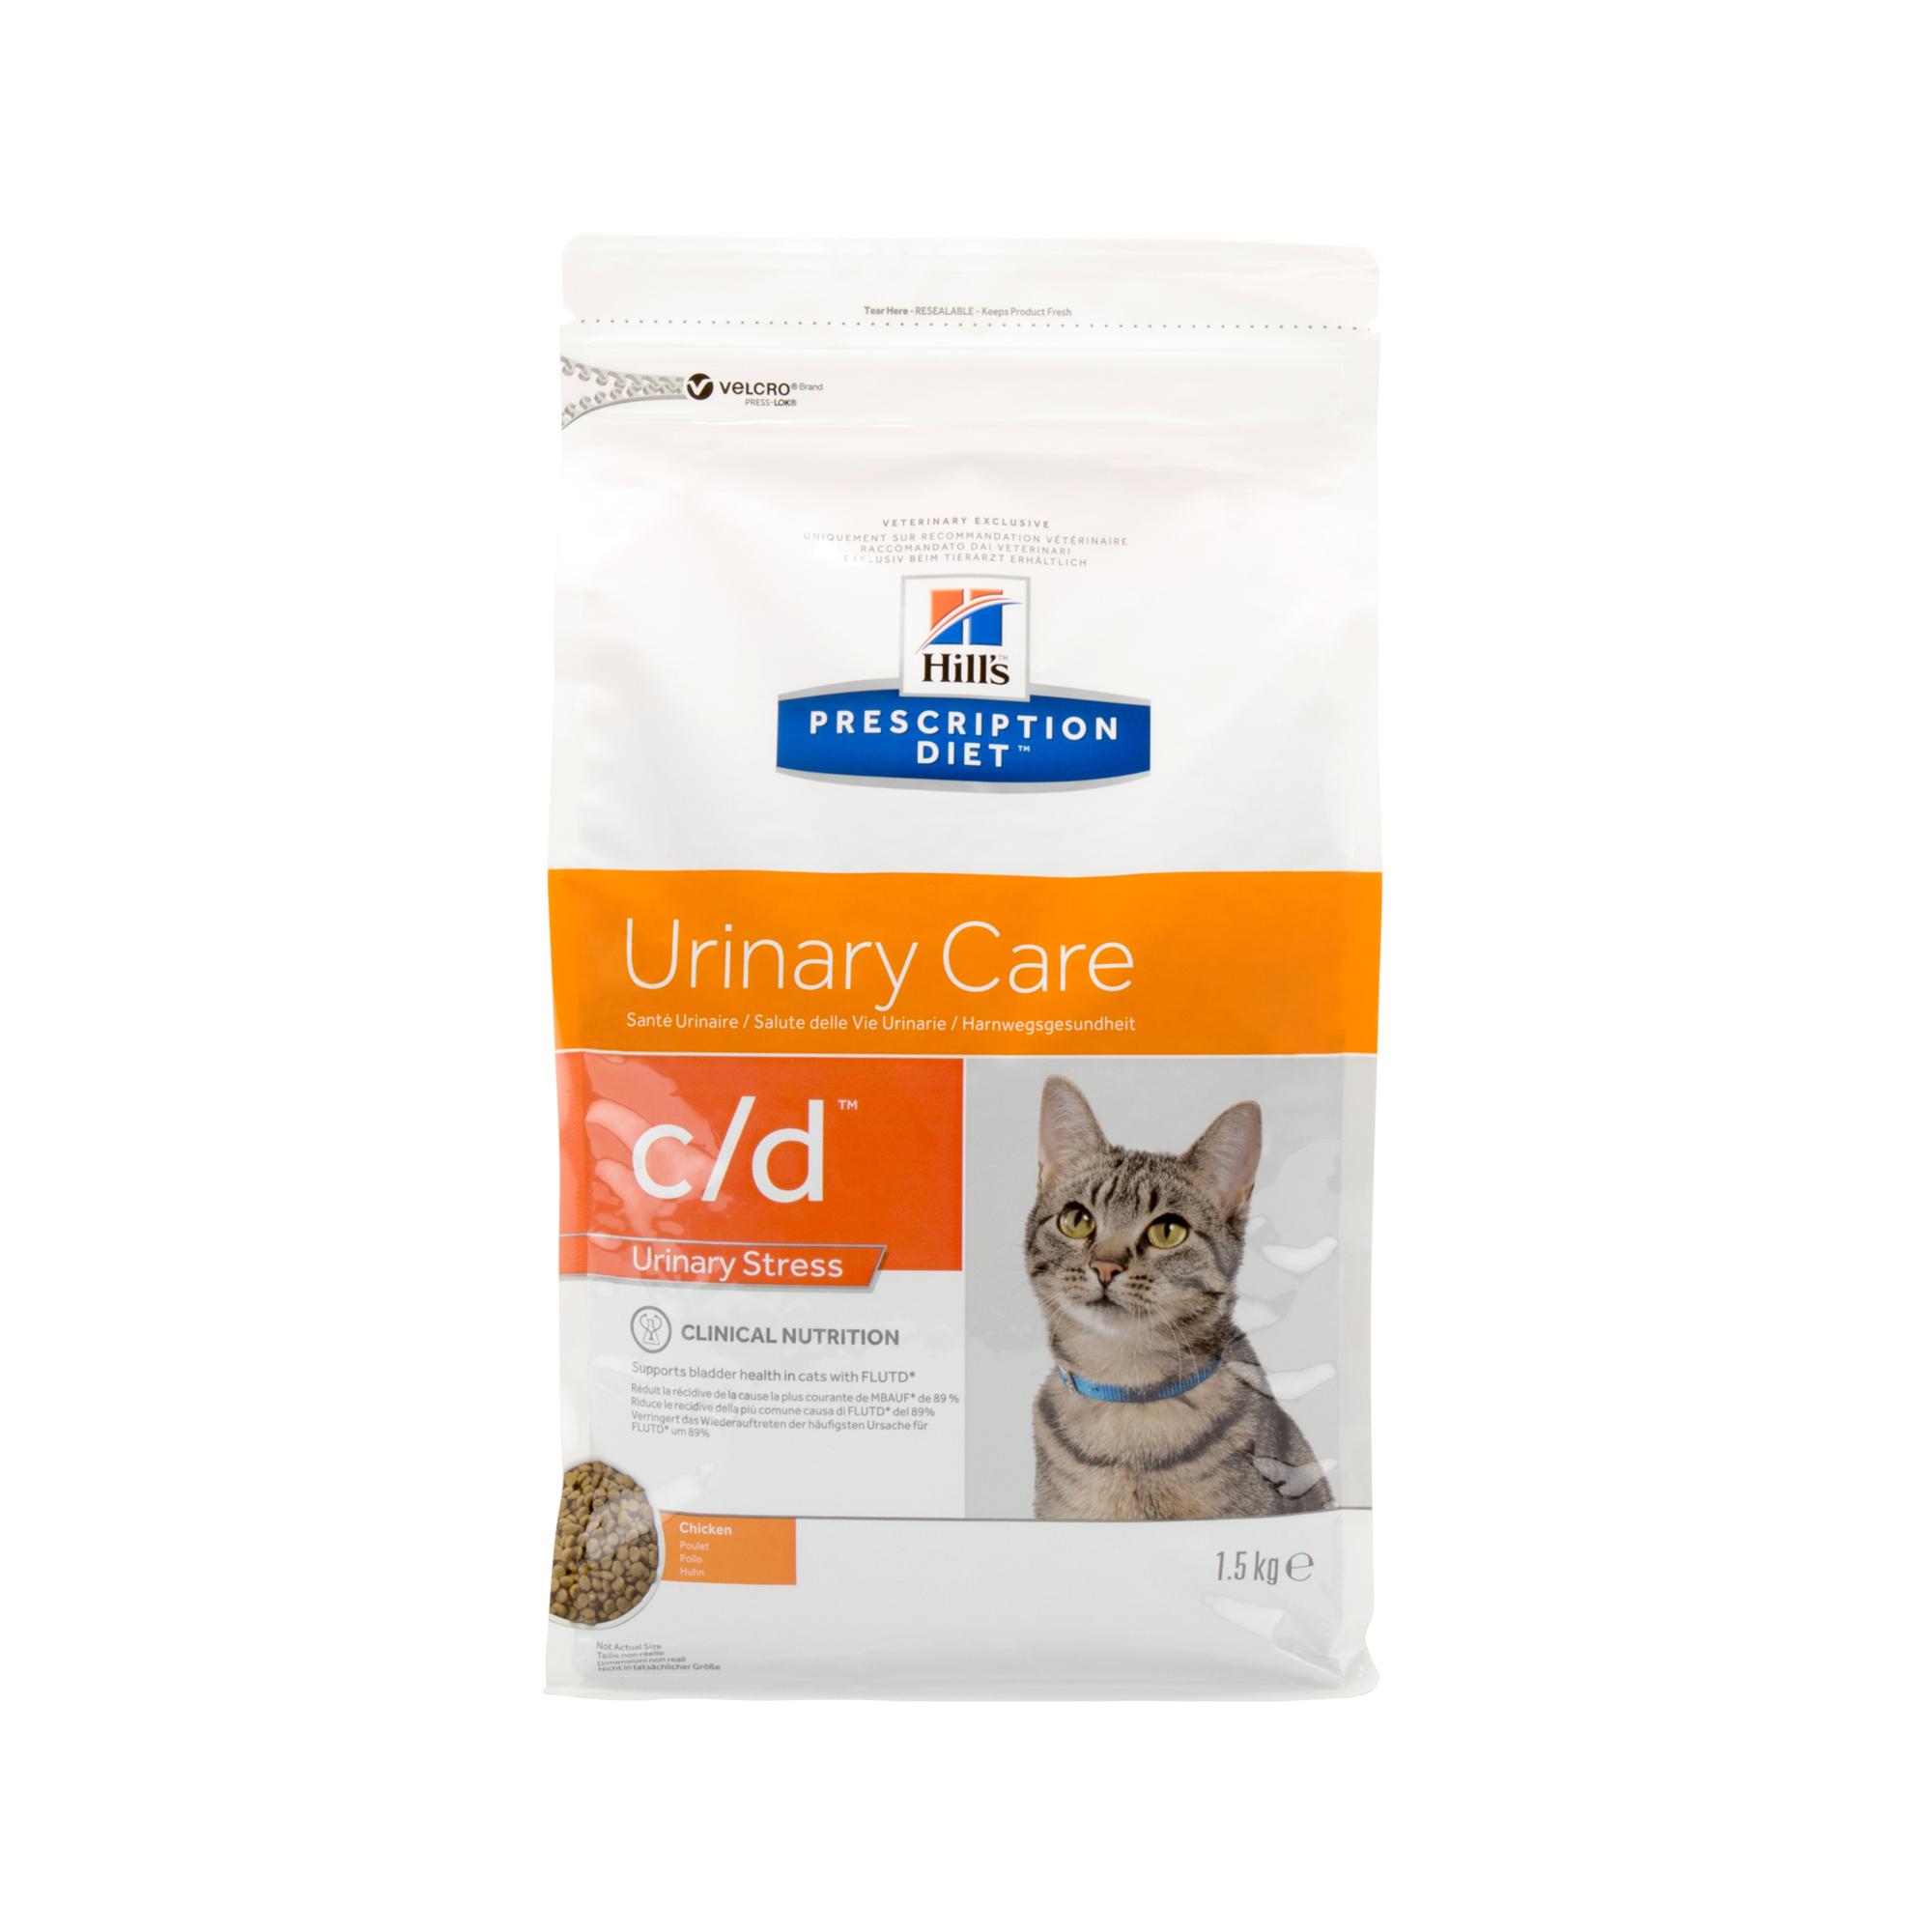 Hill's Prescription Diet c/d Urinary Stress Katzenfutter - Huhn